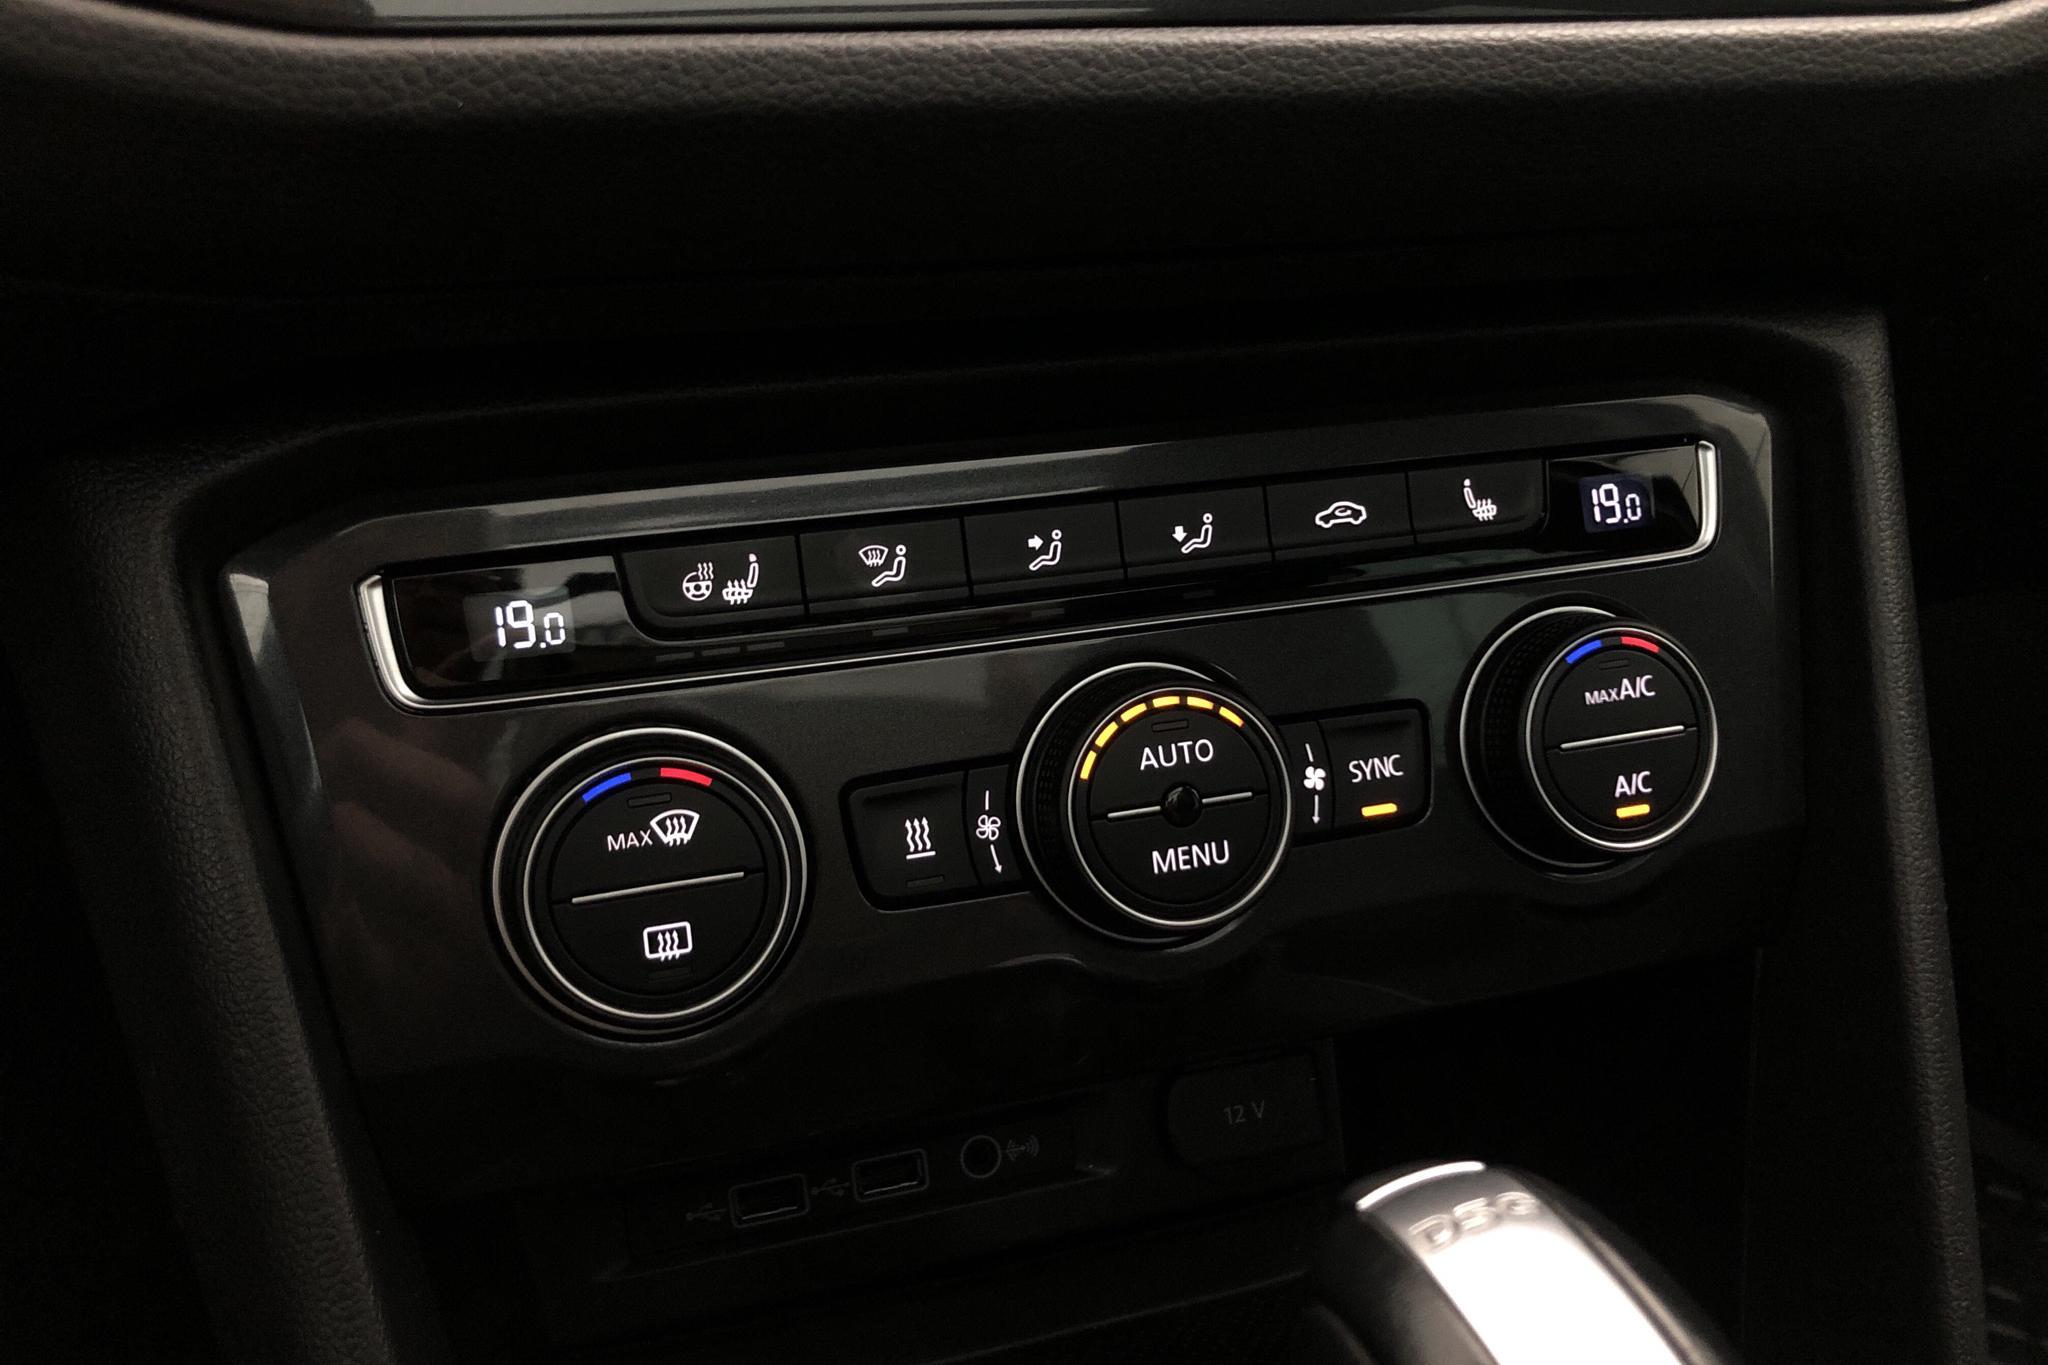 VW Tiguan 2.0 TDI 4MOTION (190hk) - 7 600 mil - Automat - svart - 2018